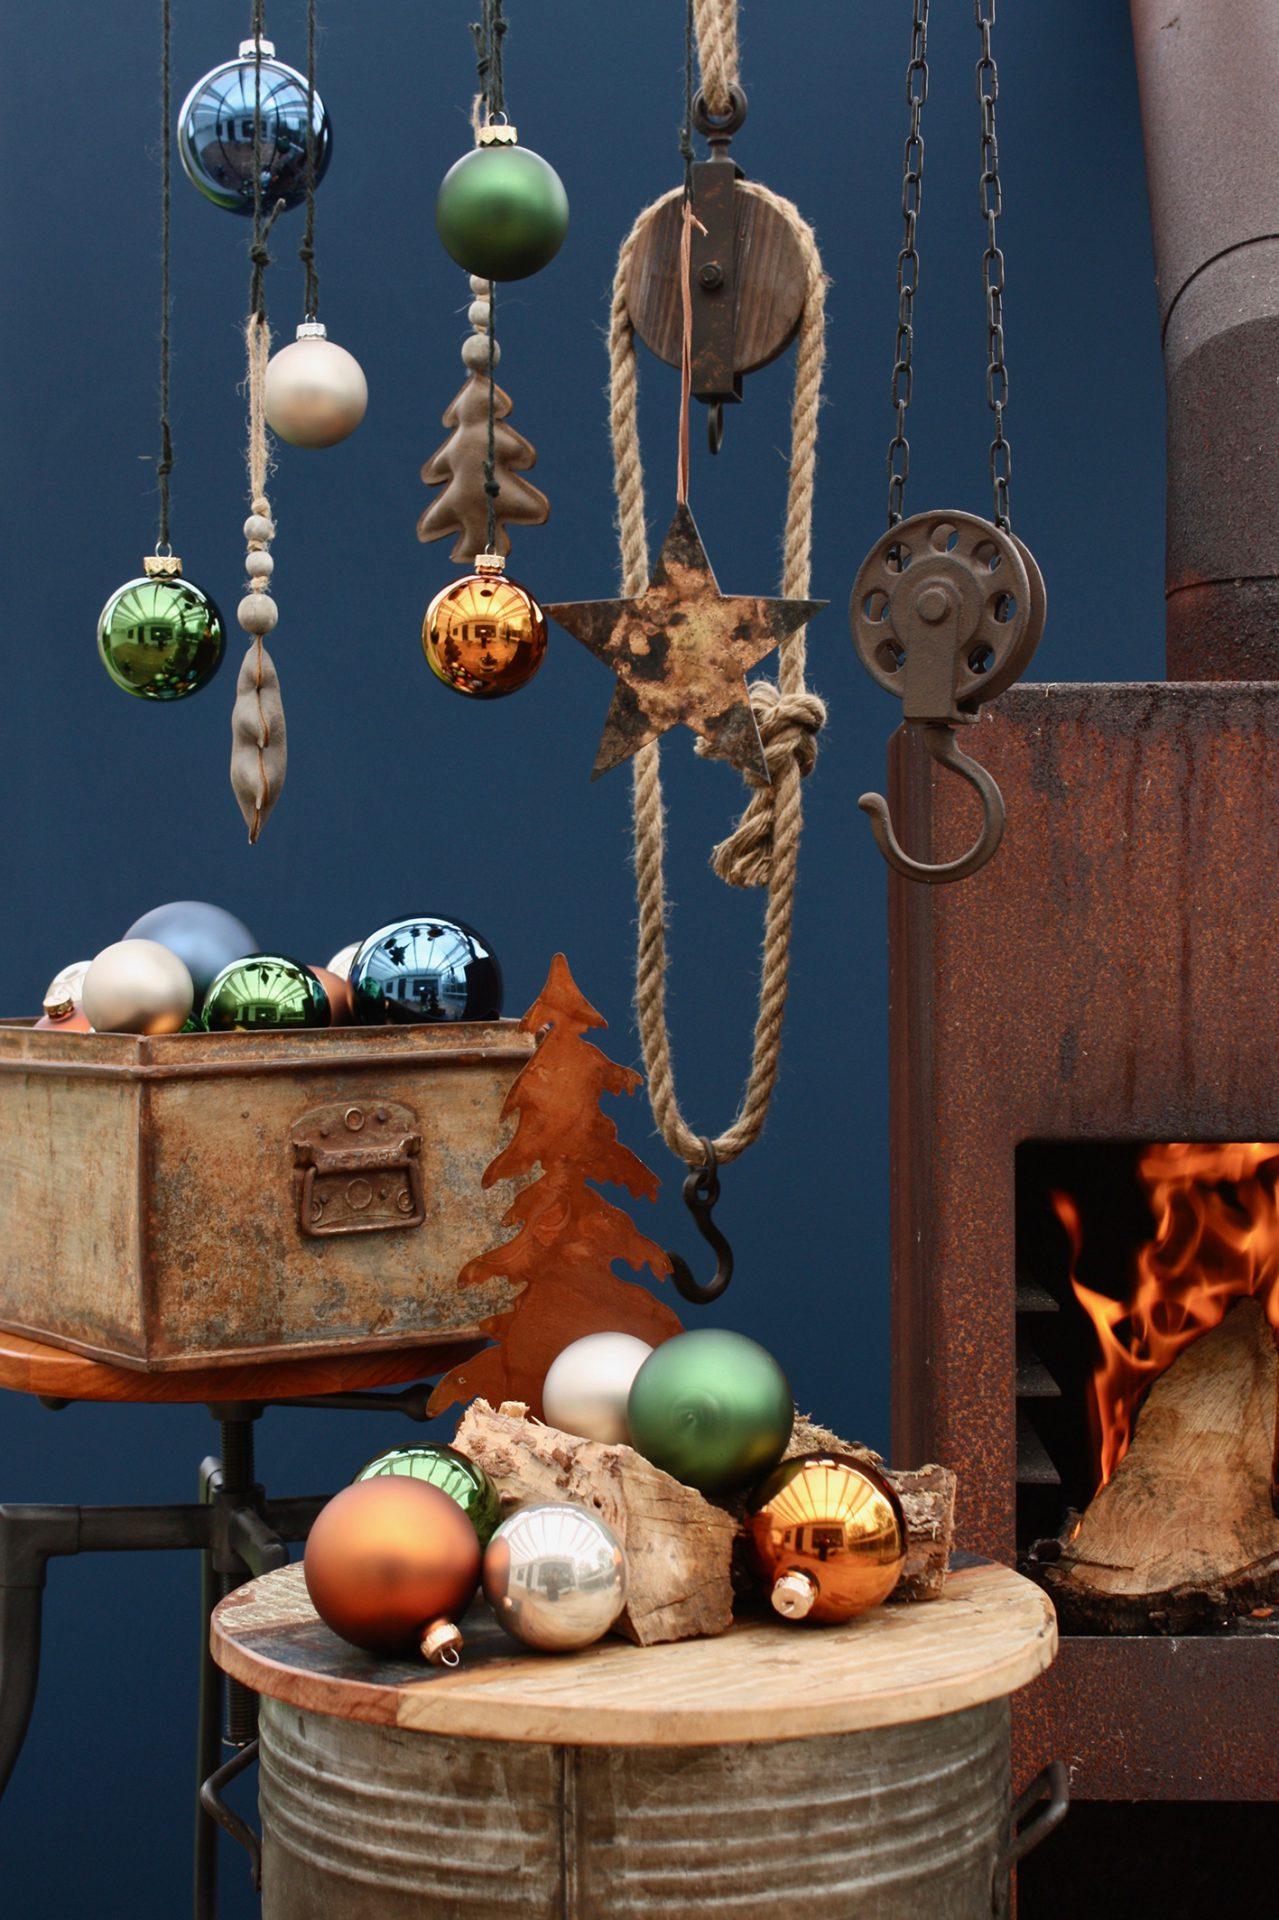 Robuust stijlconcept kerstdecoratie